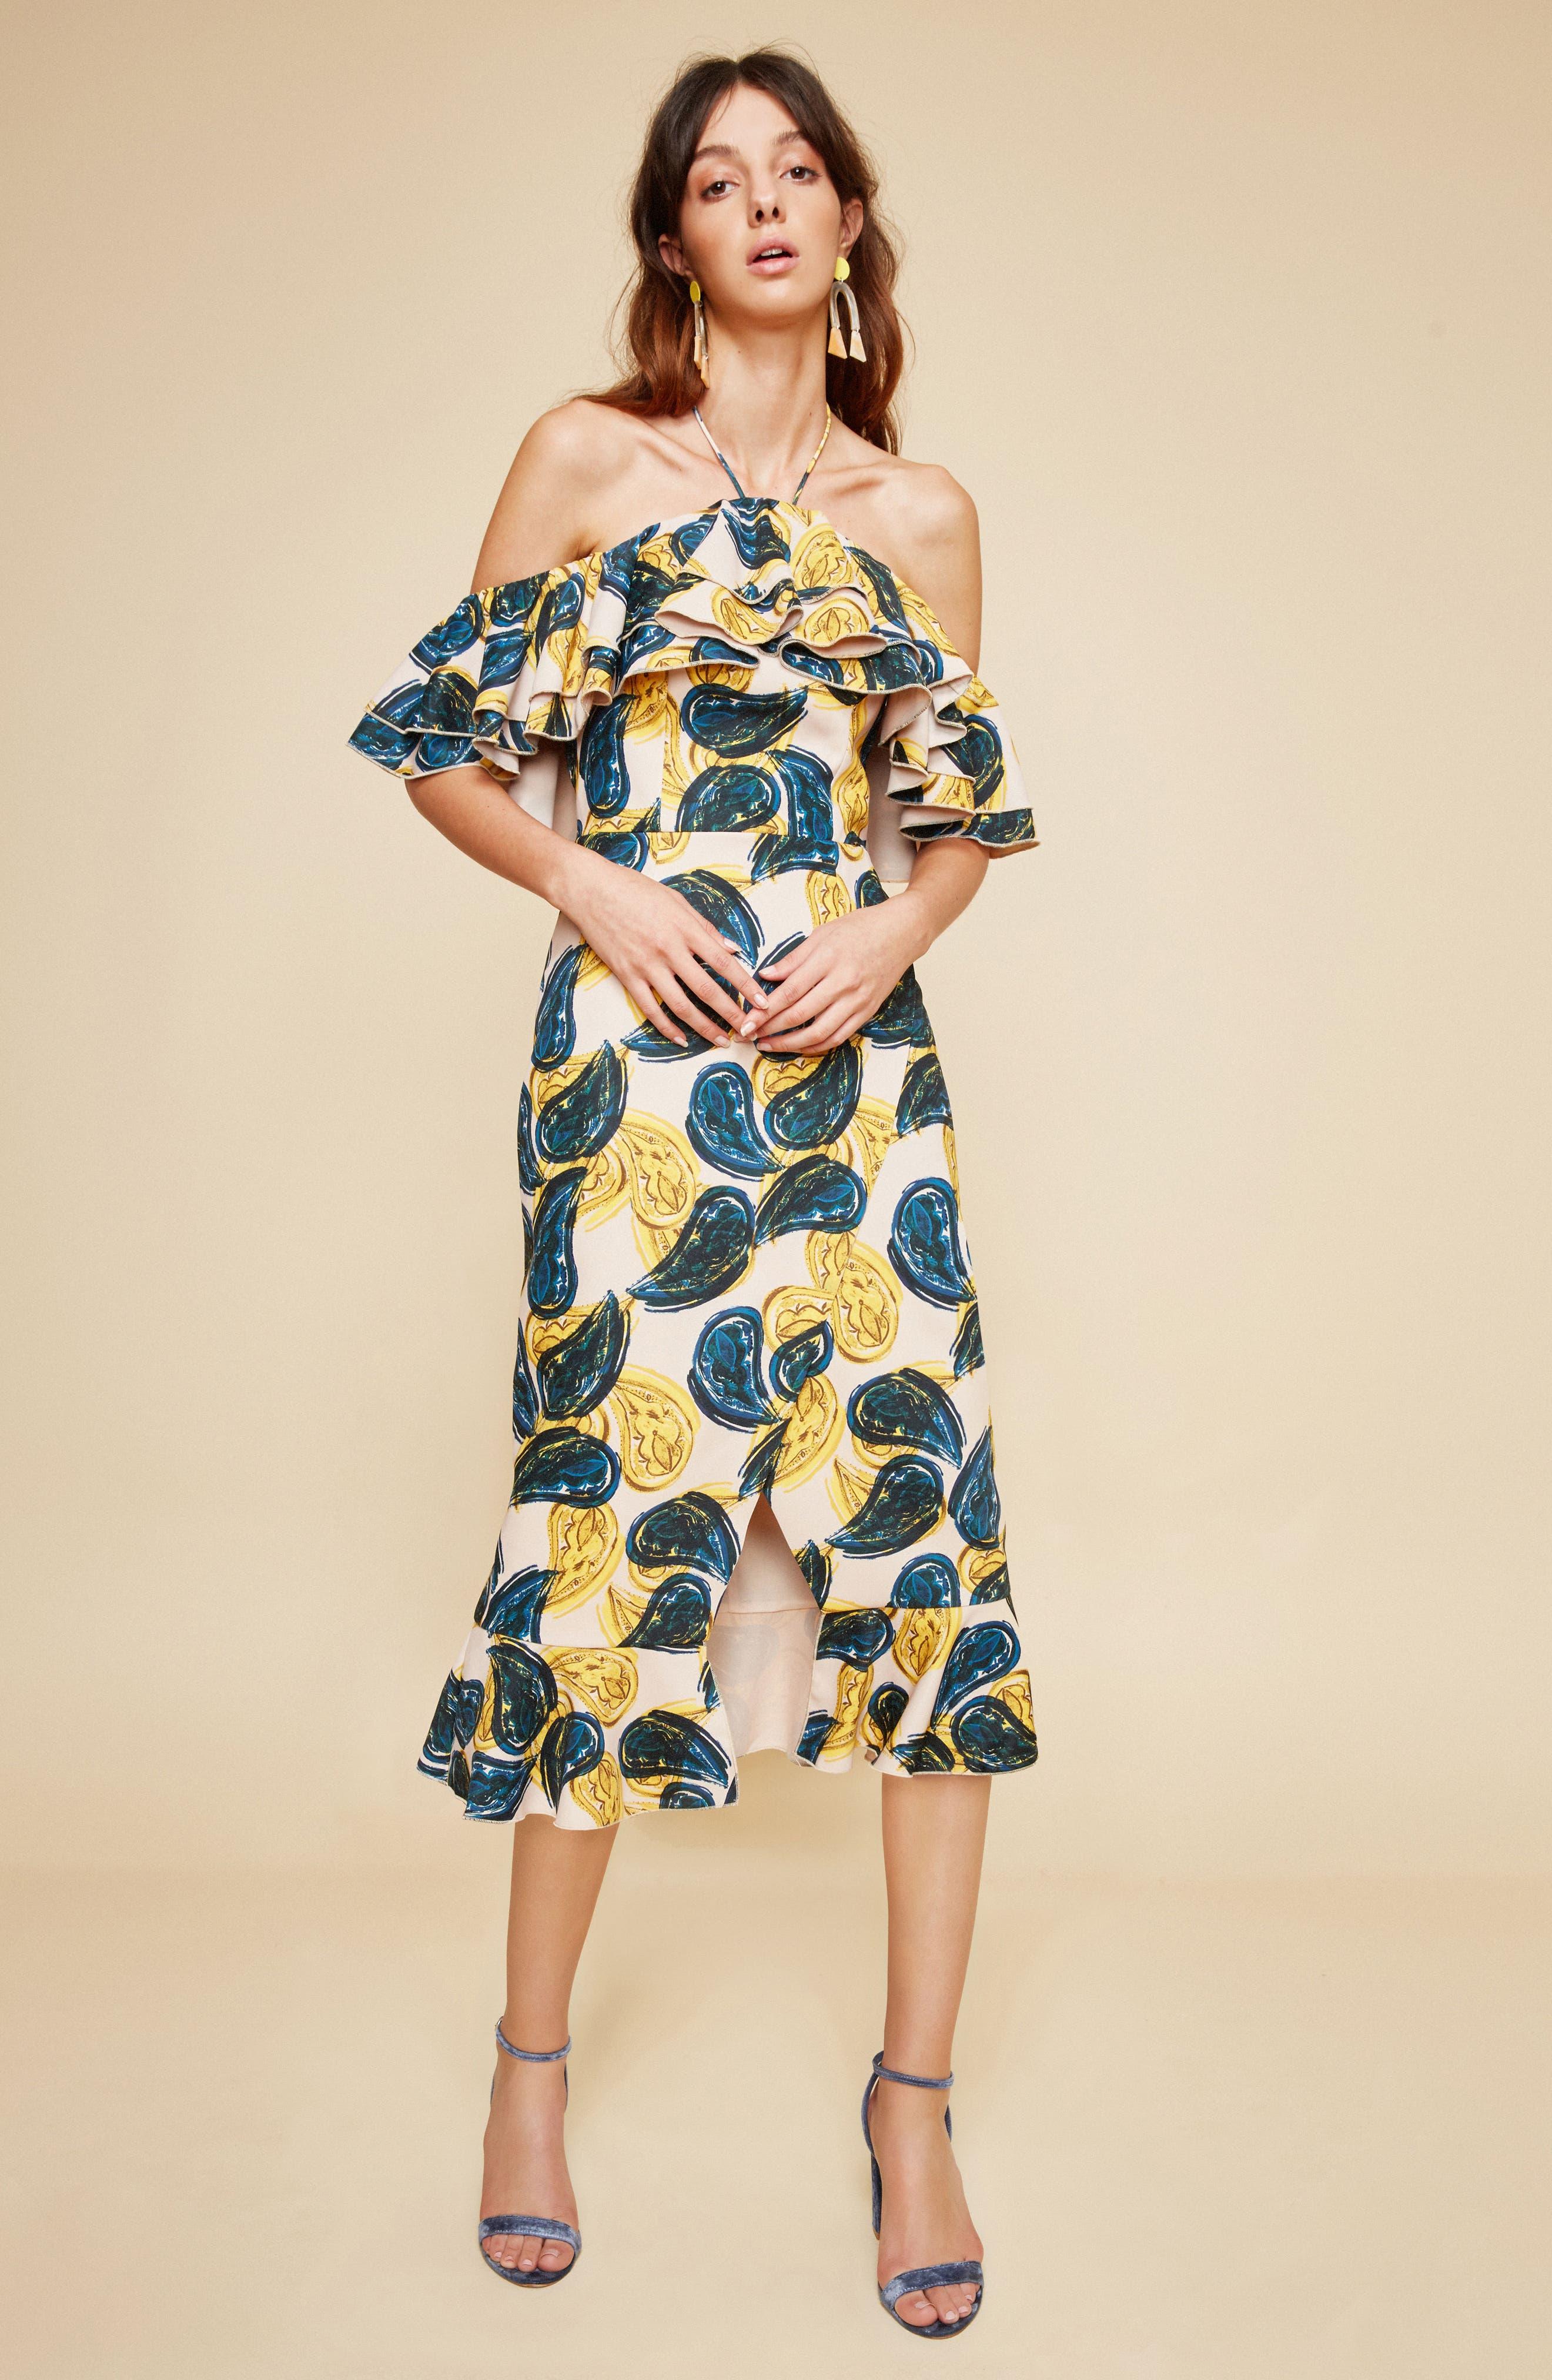 Temptation Halter Sheath Dress,                             Alternate thumbnail 2, color,                             Blush Paisley